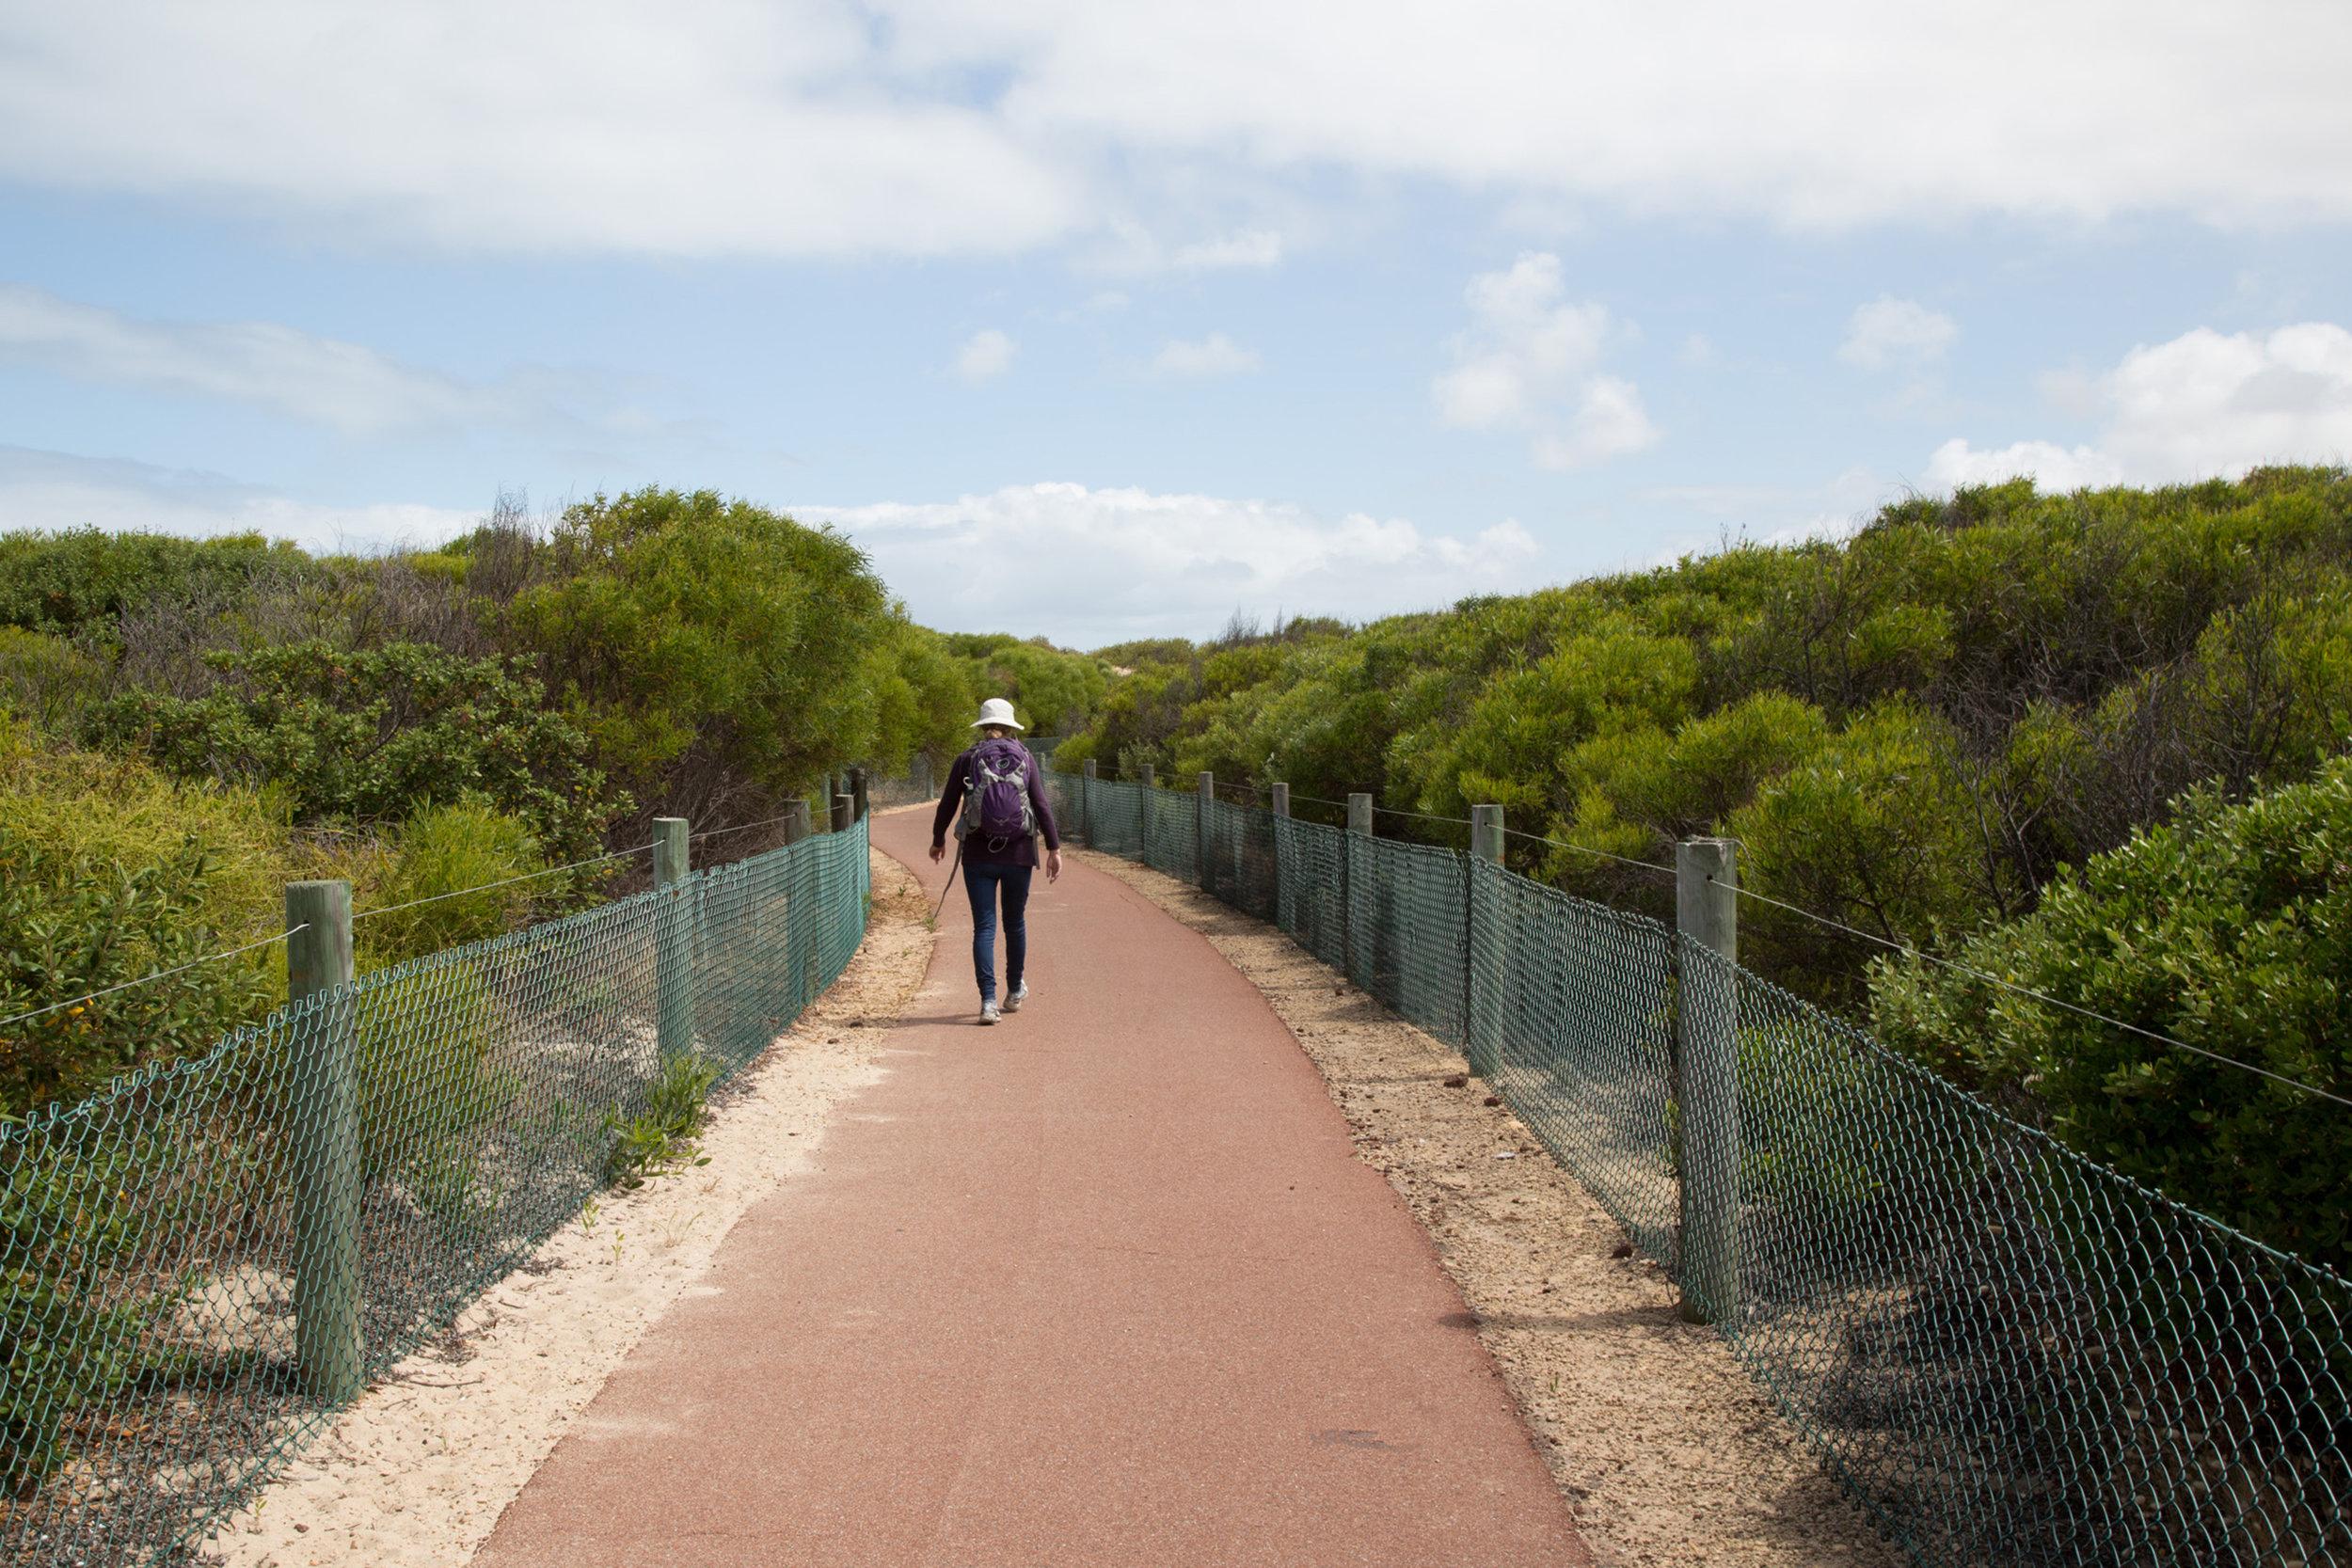 Plate 12: Path through Golden Bay.